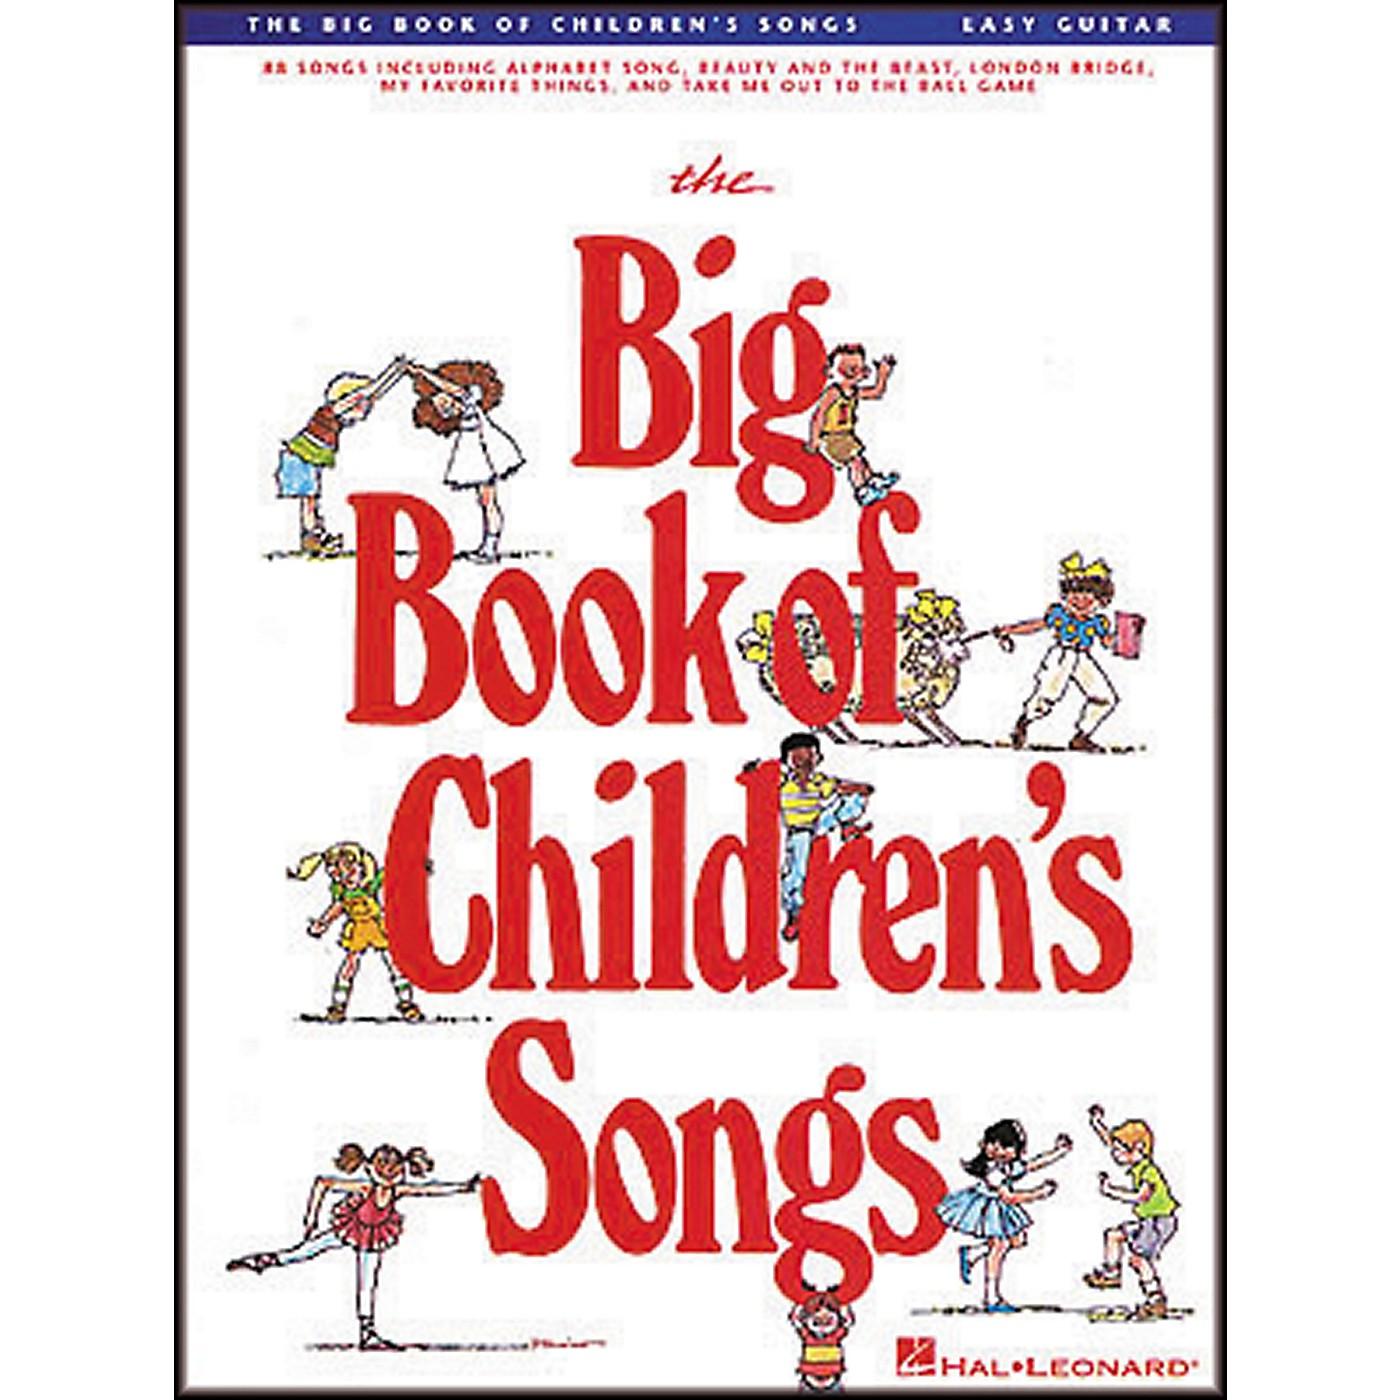 Hal Leonard The Big Book of Children's Songs Easy Guitar Tab Songbook thumbnail